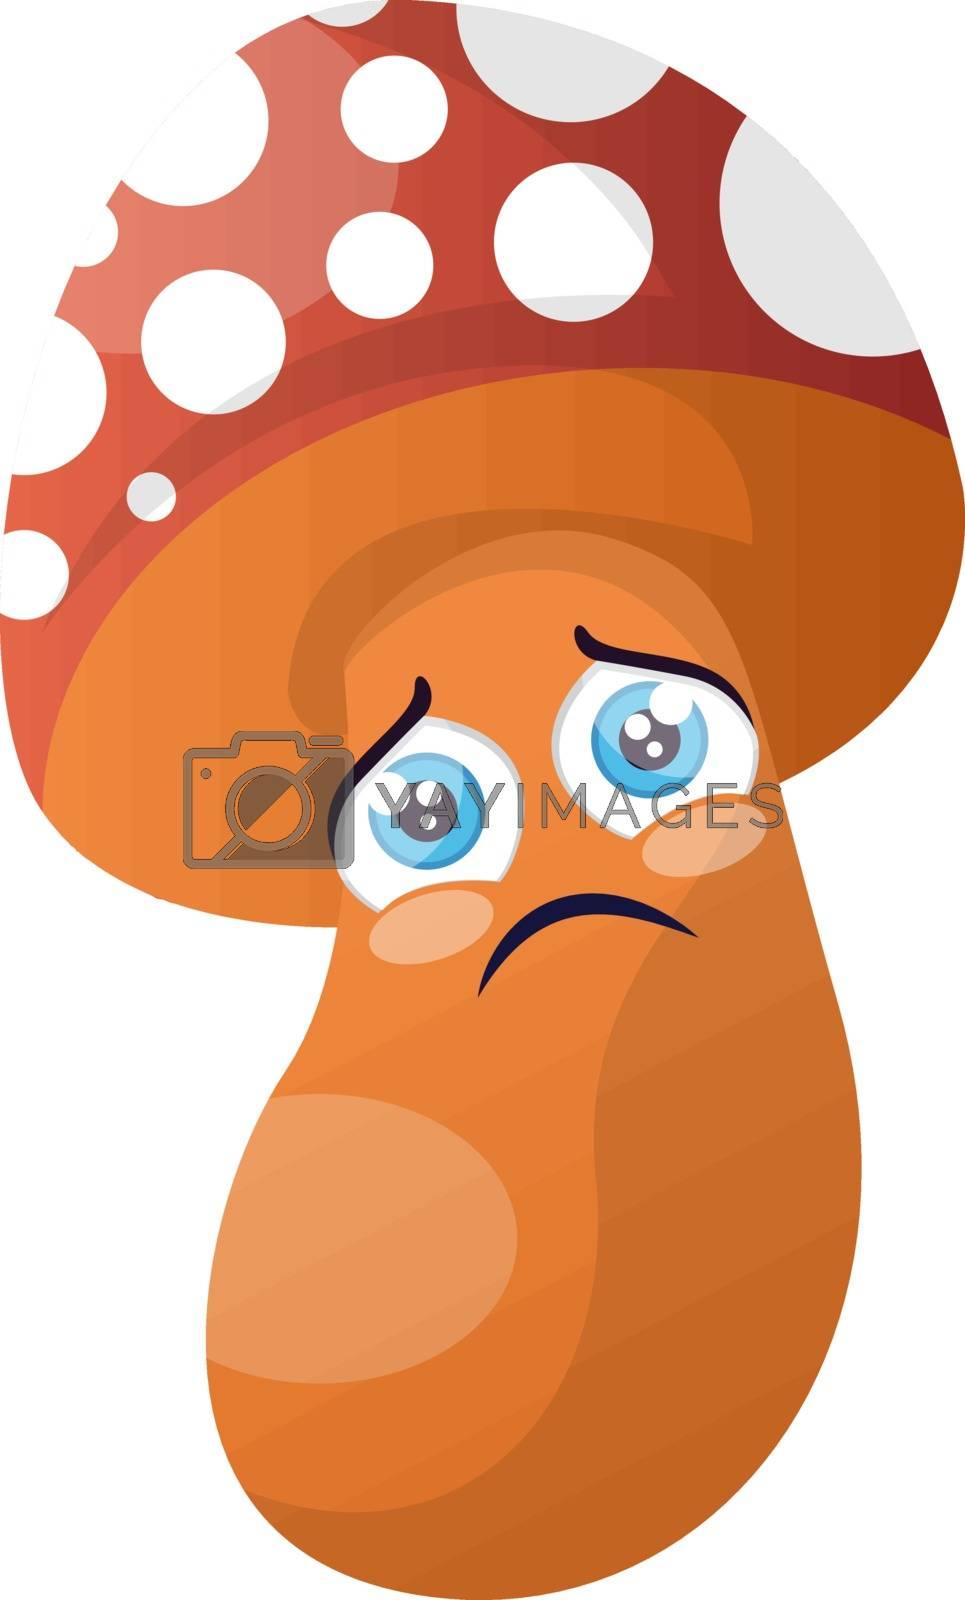 Royalty free image of Sad cartoon mushroom illustration vector on white background by Morphart